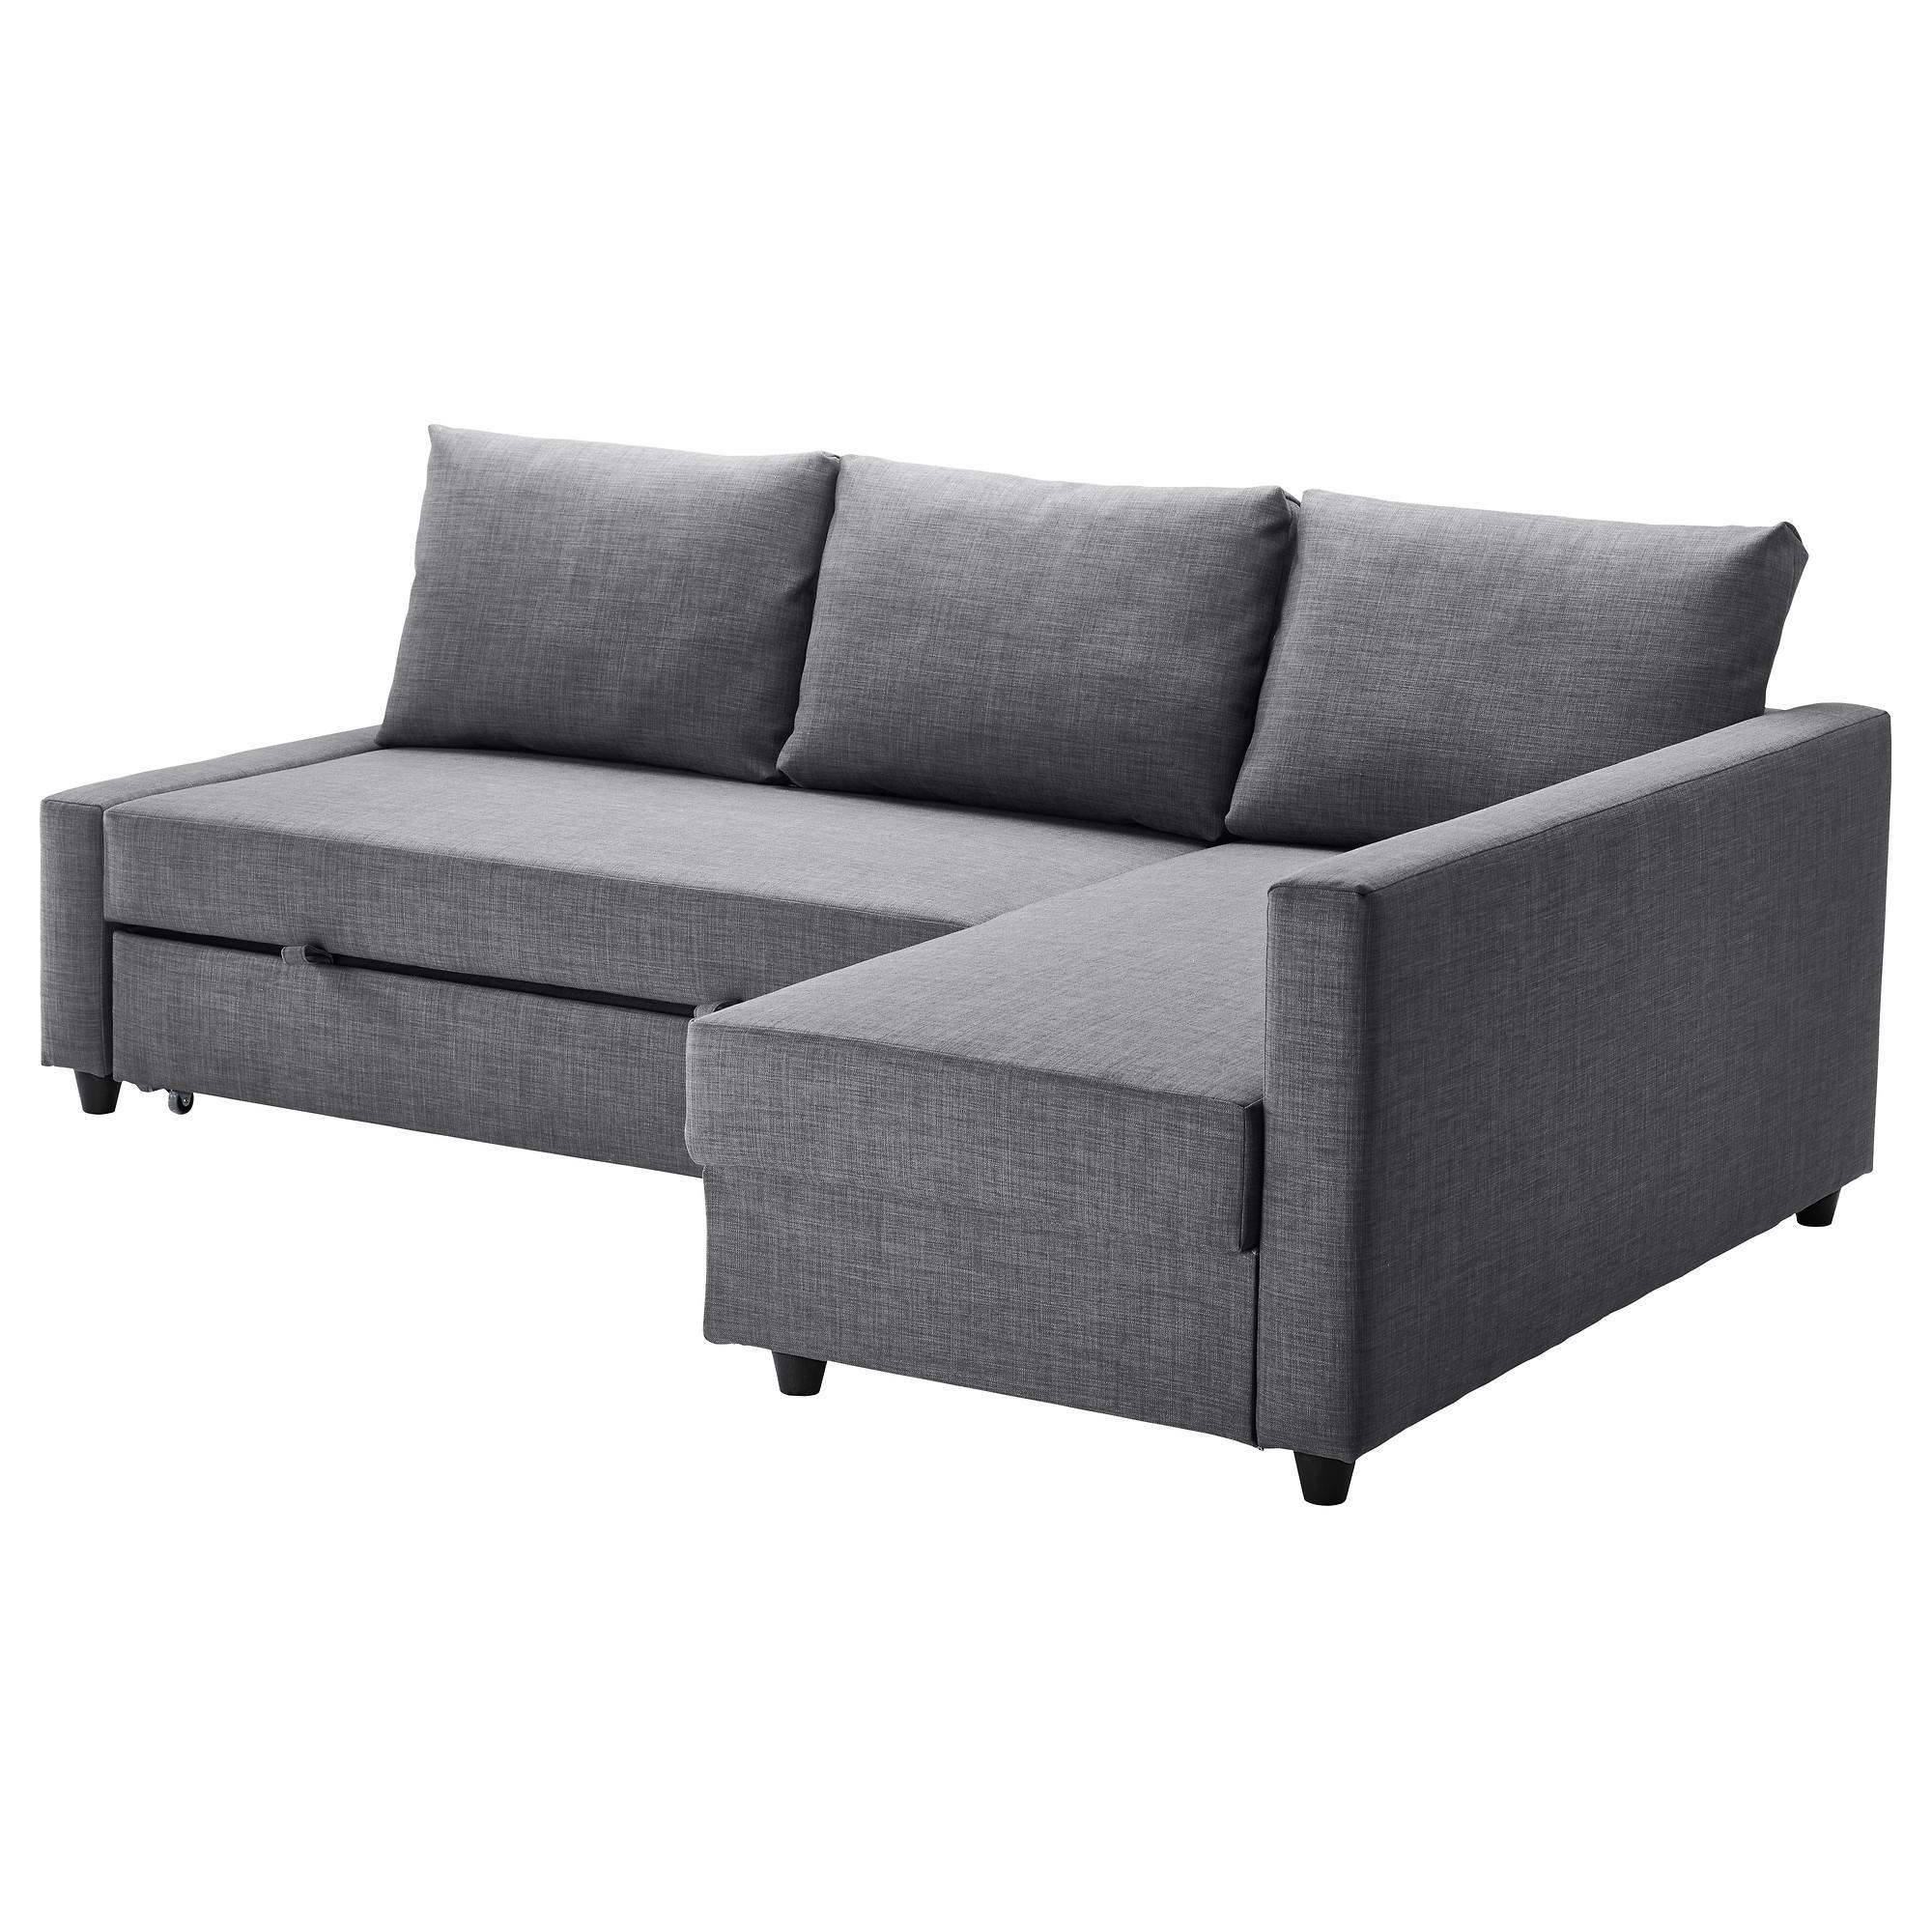 Featured Image of Ikea Sectional Sofa Sleeper